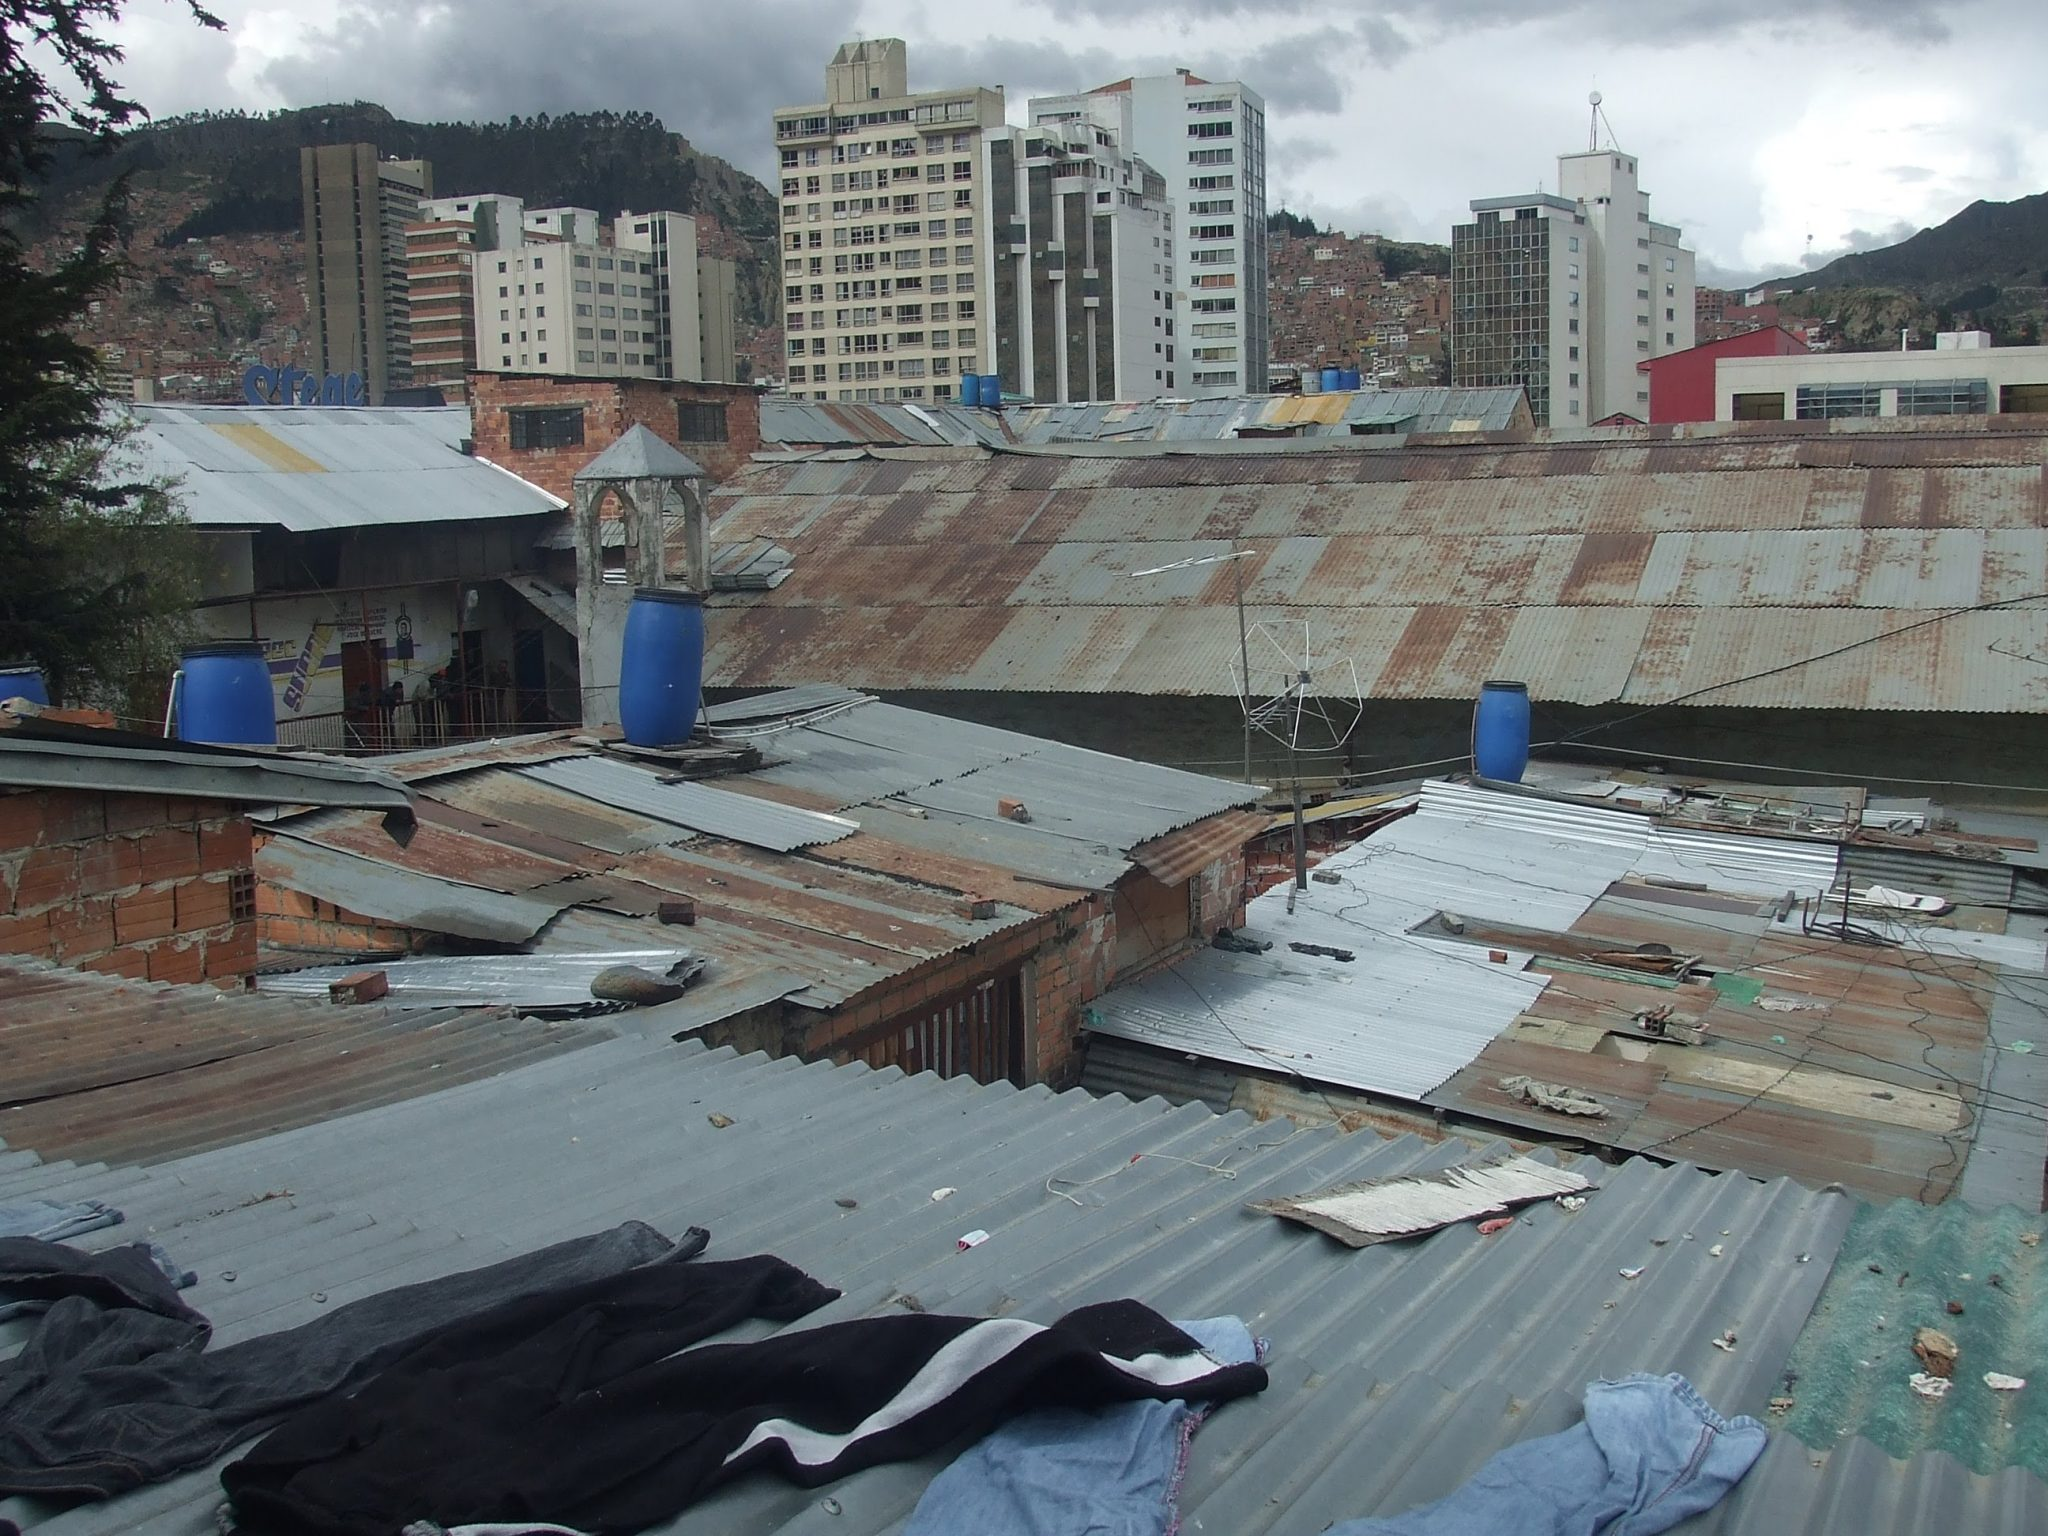 Inside La Paz's notorious San Pedro Prison